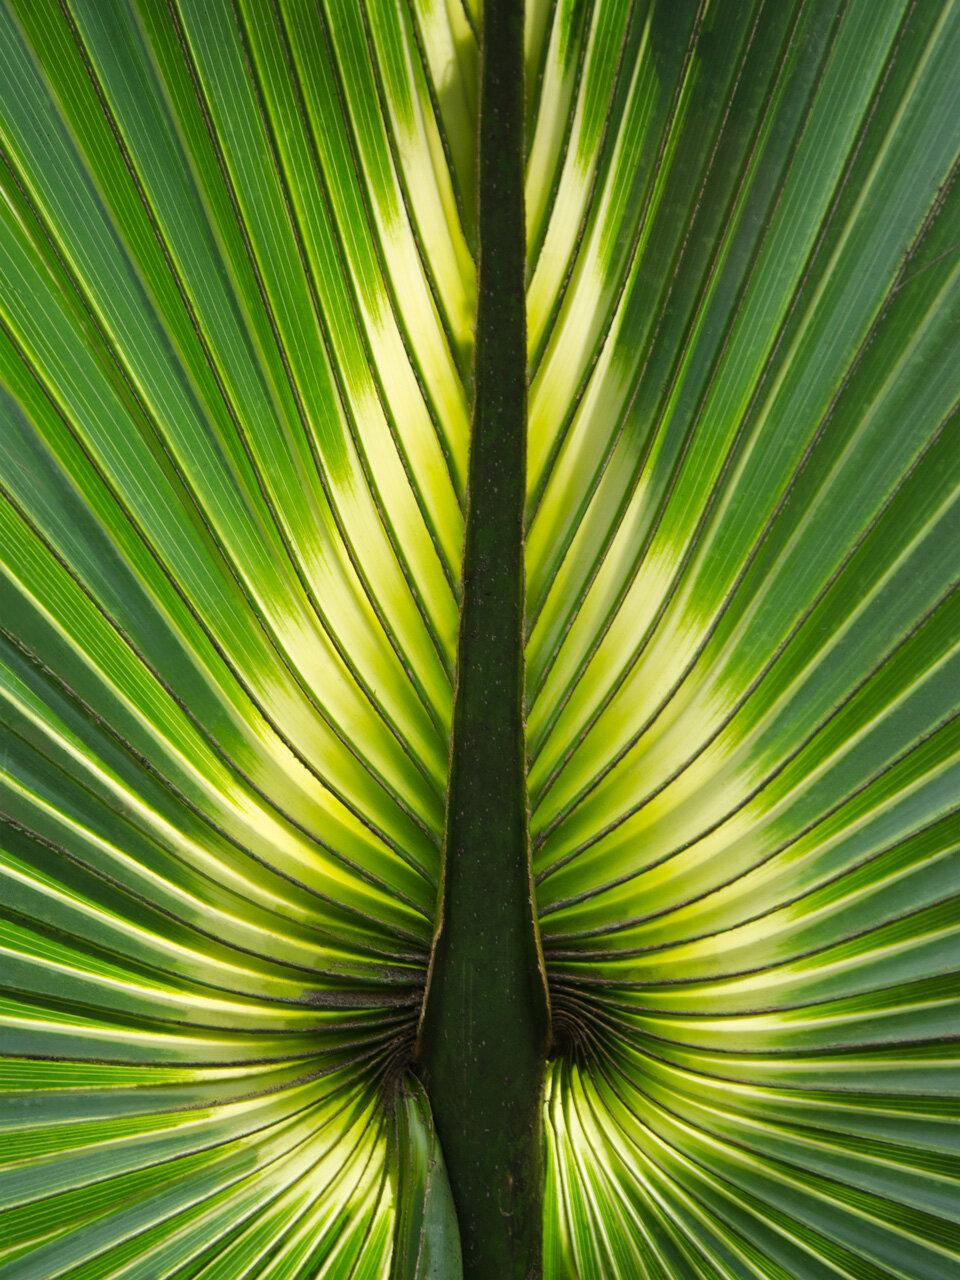 """Myakka Palm"" by Roger Leege"